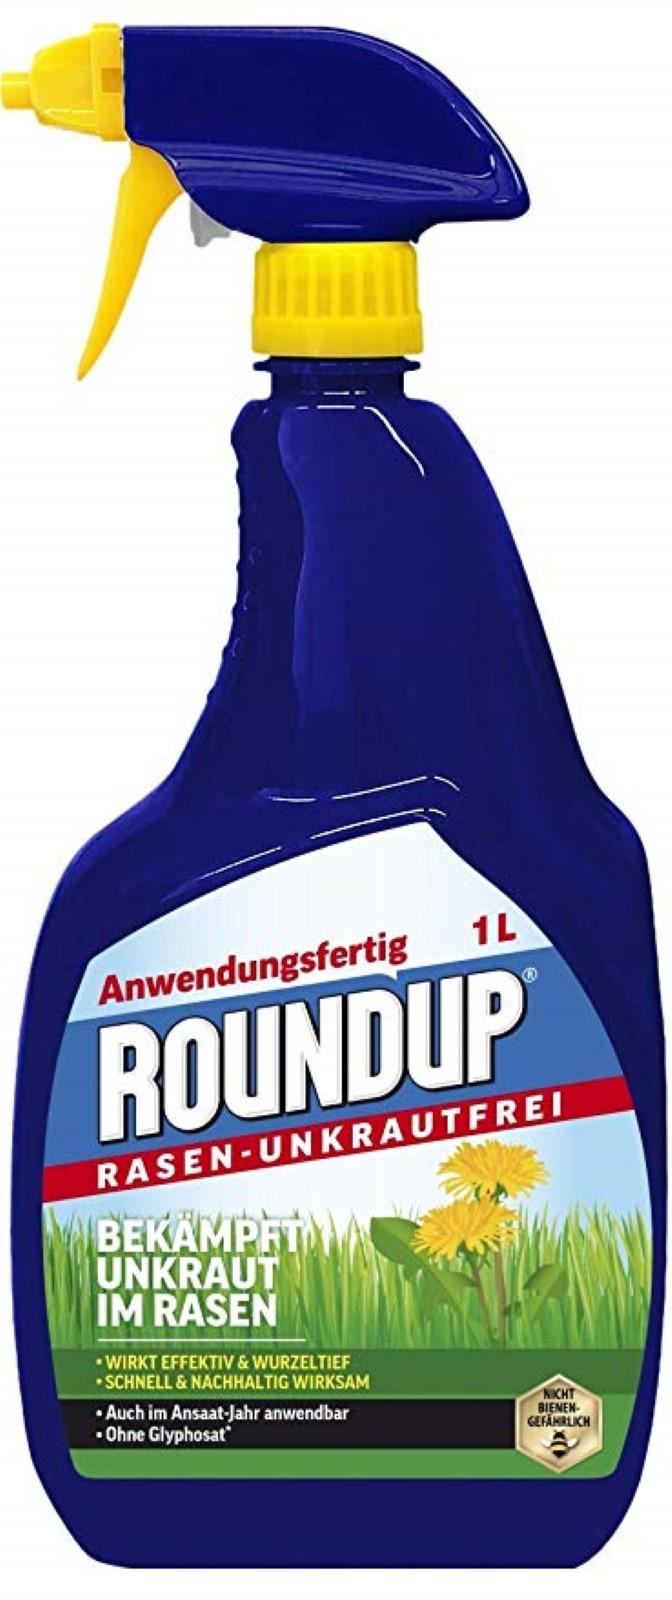 Roundup Rasen Unkrautfrei  1 L